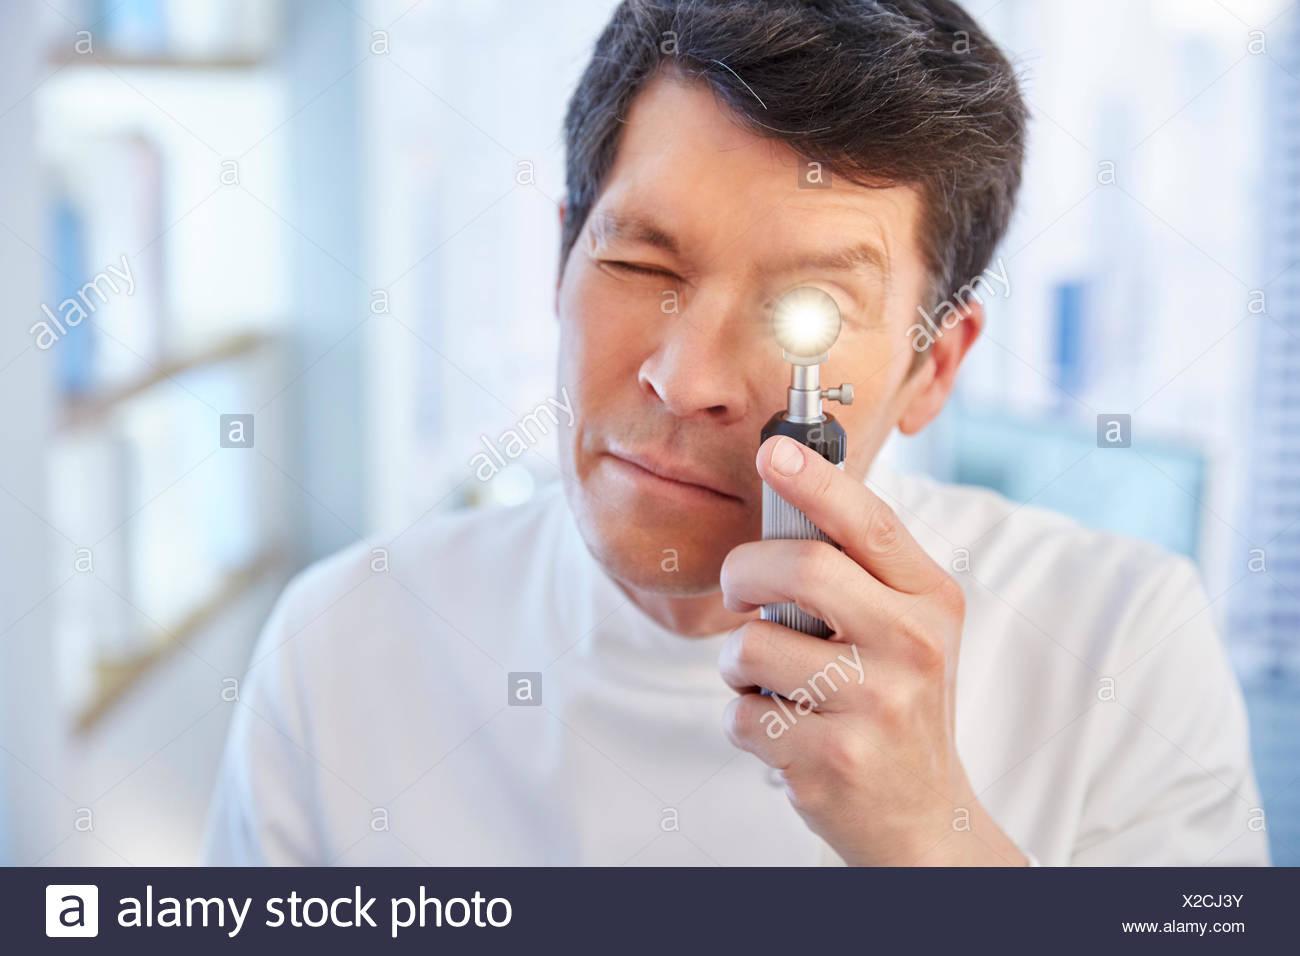 Man looking through illuminated speculum in laboratory - Stock Image